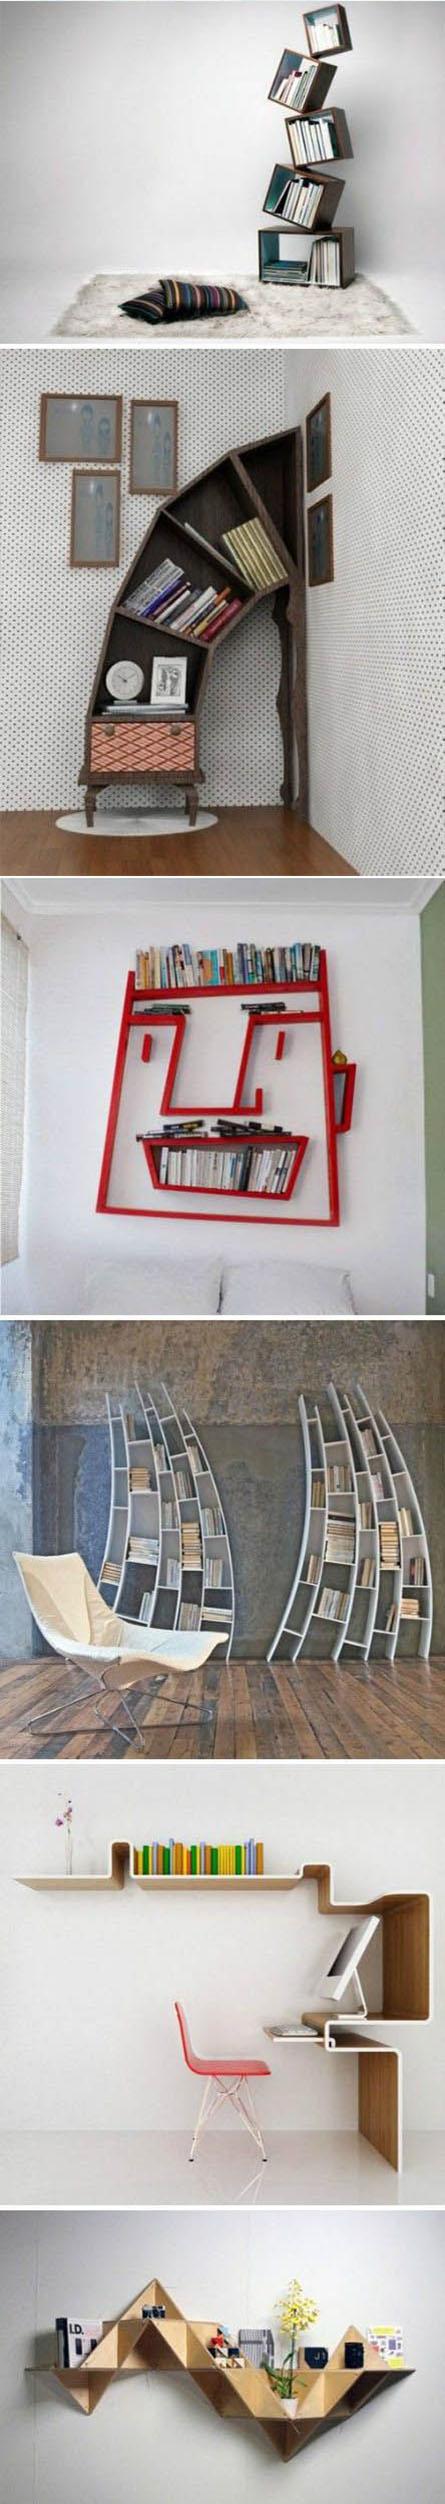 Great Bookshelf Ideas | DIY & Crafts Tutorials